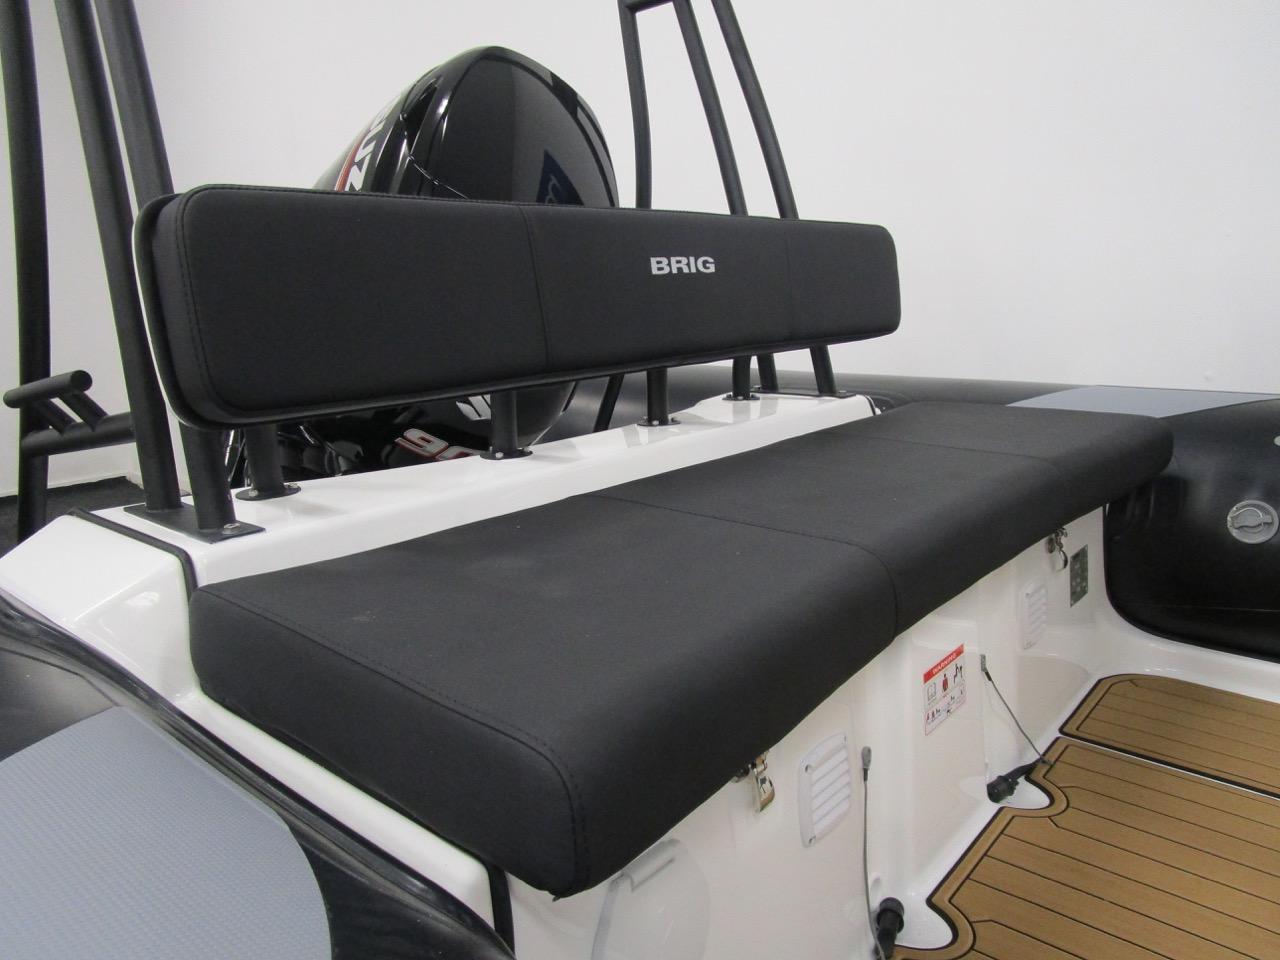 N570 rear seat